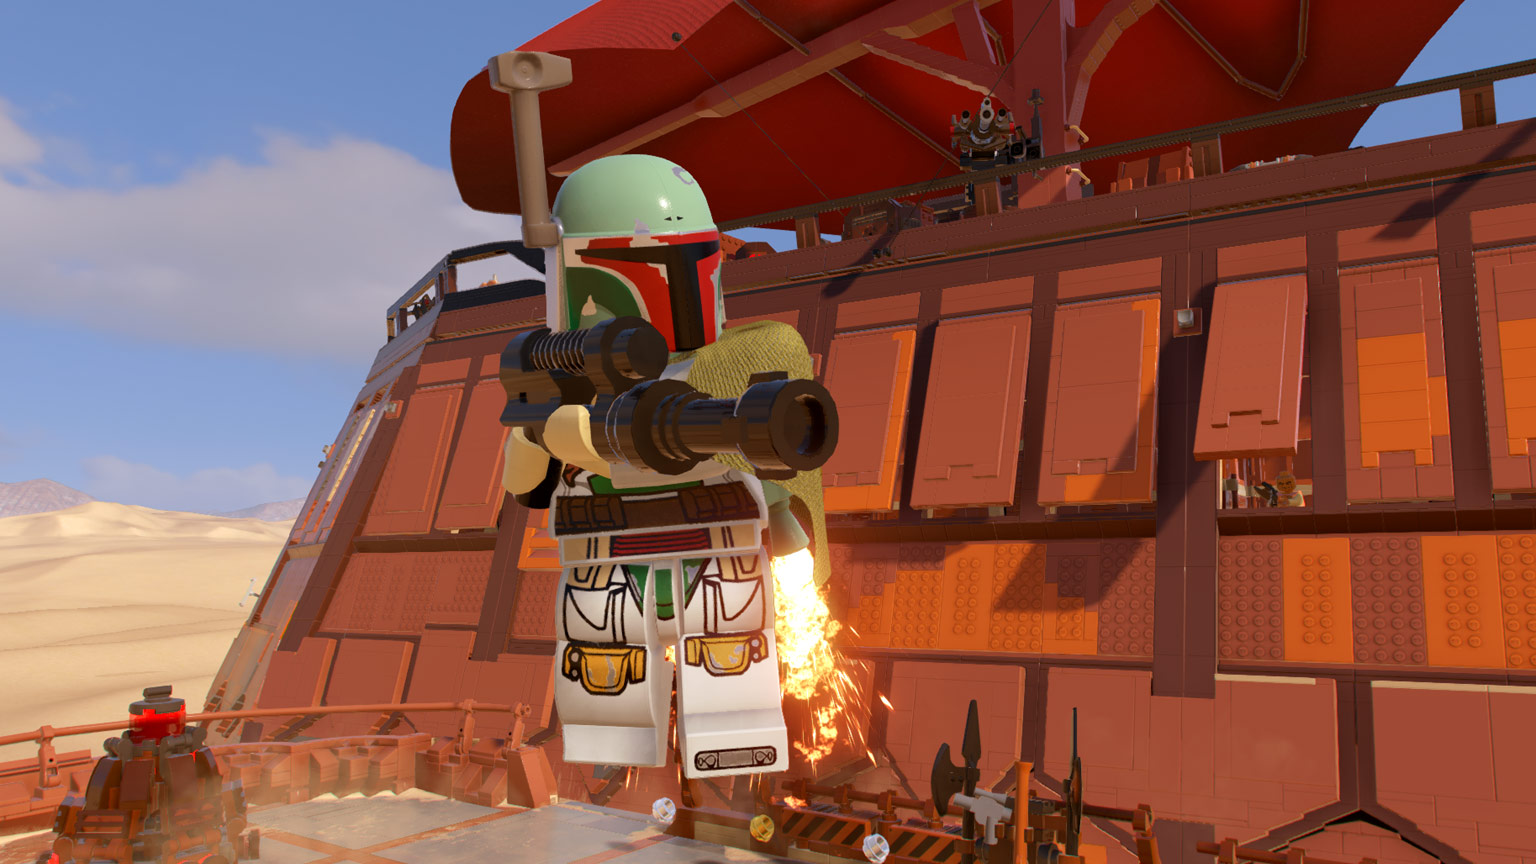 LEGO Star Wars The Skywalker Saga Tall